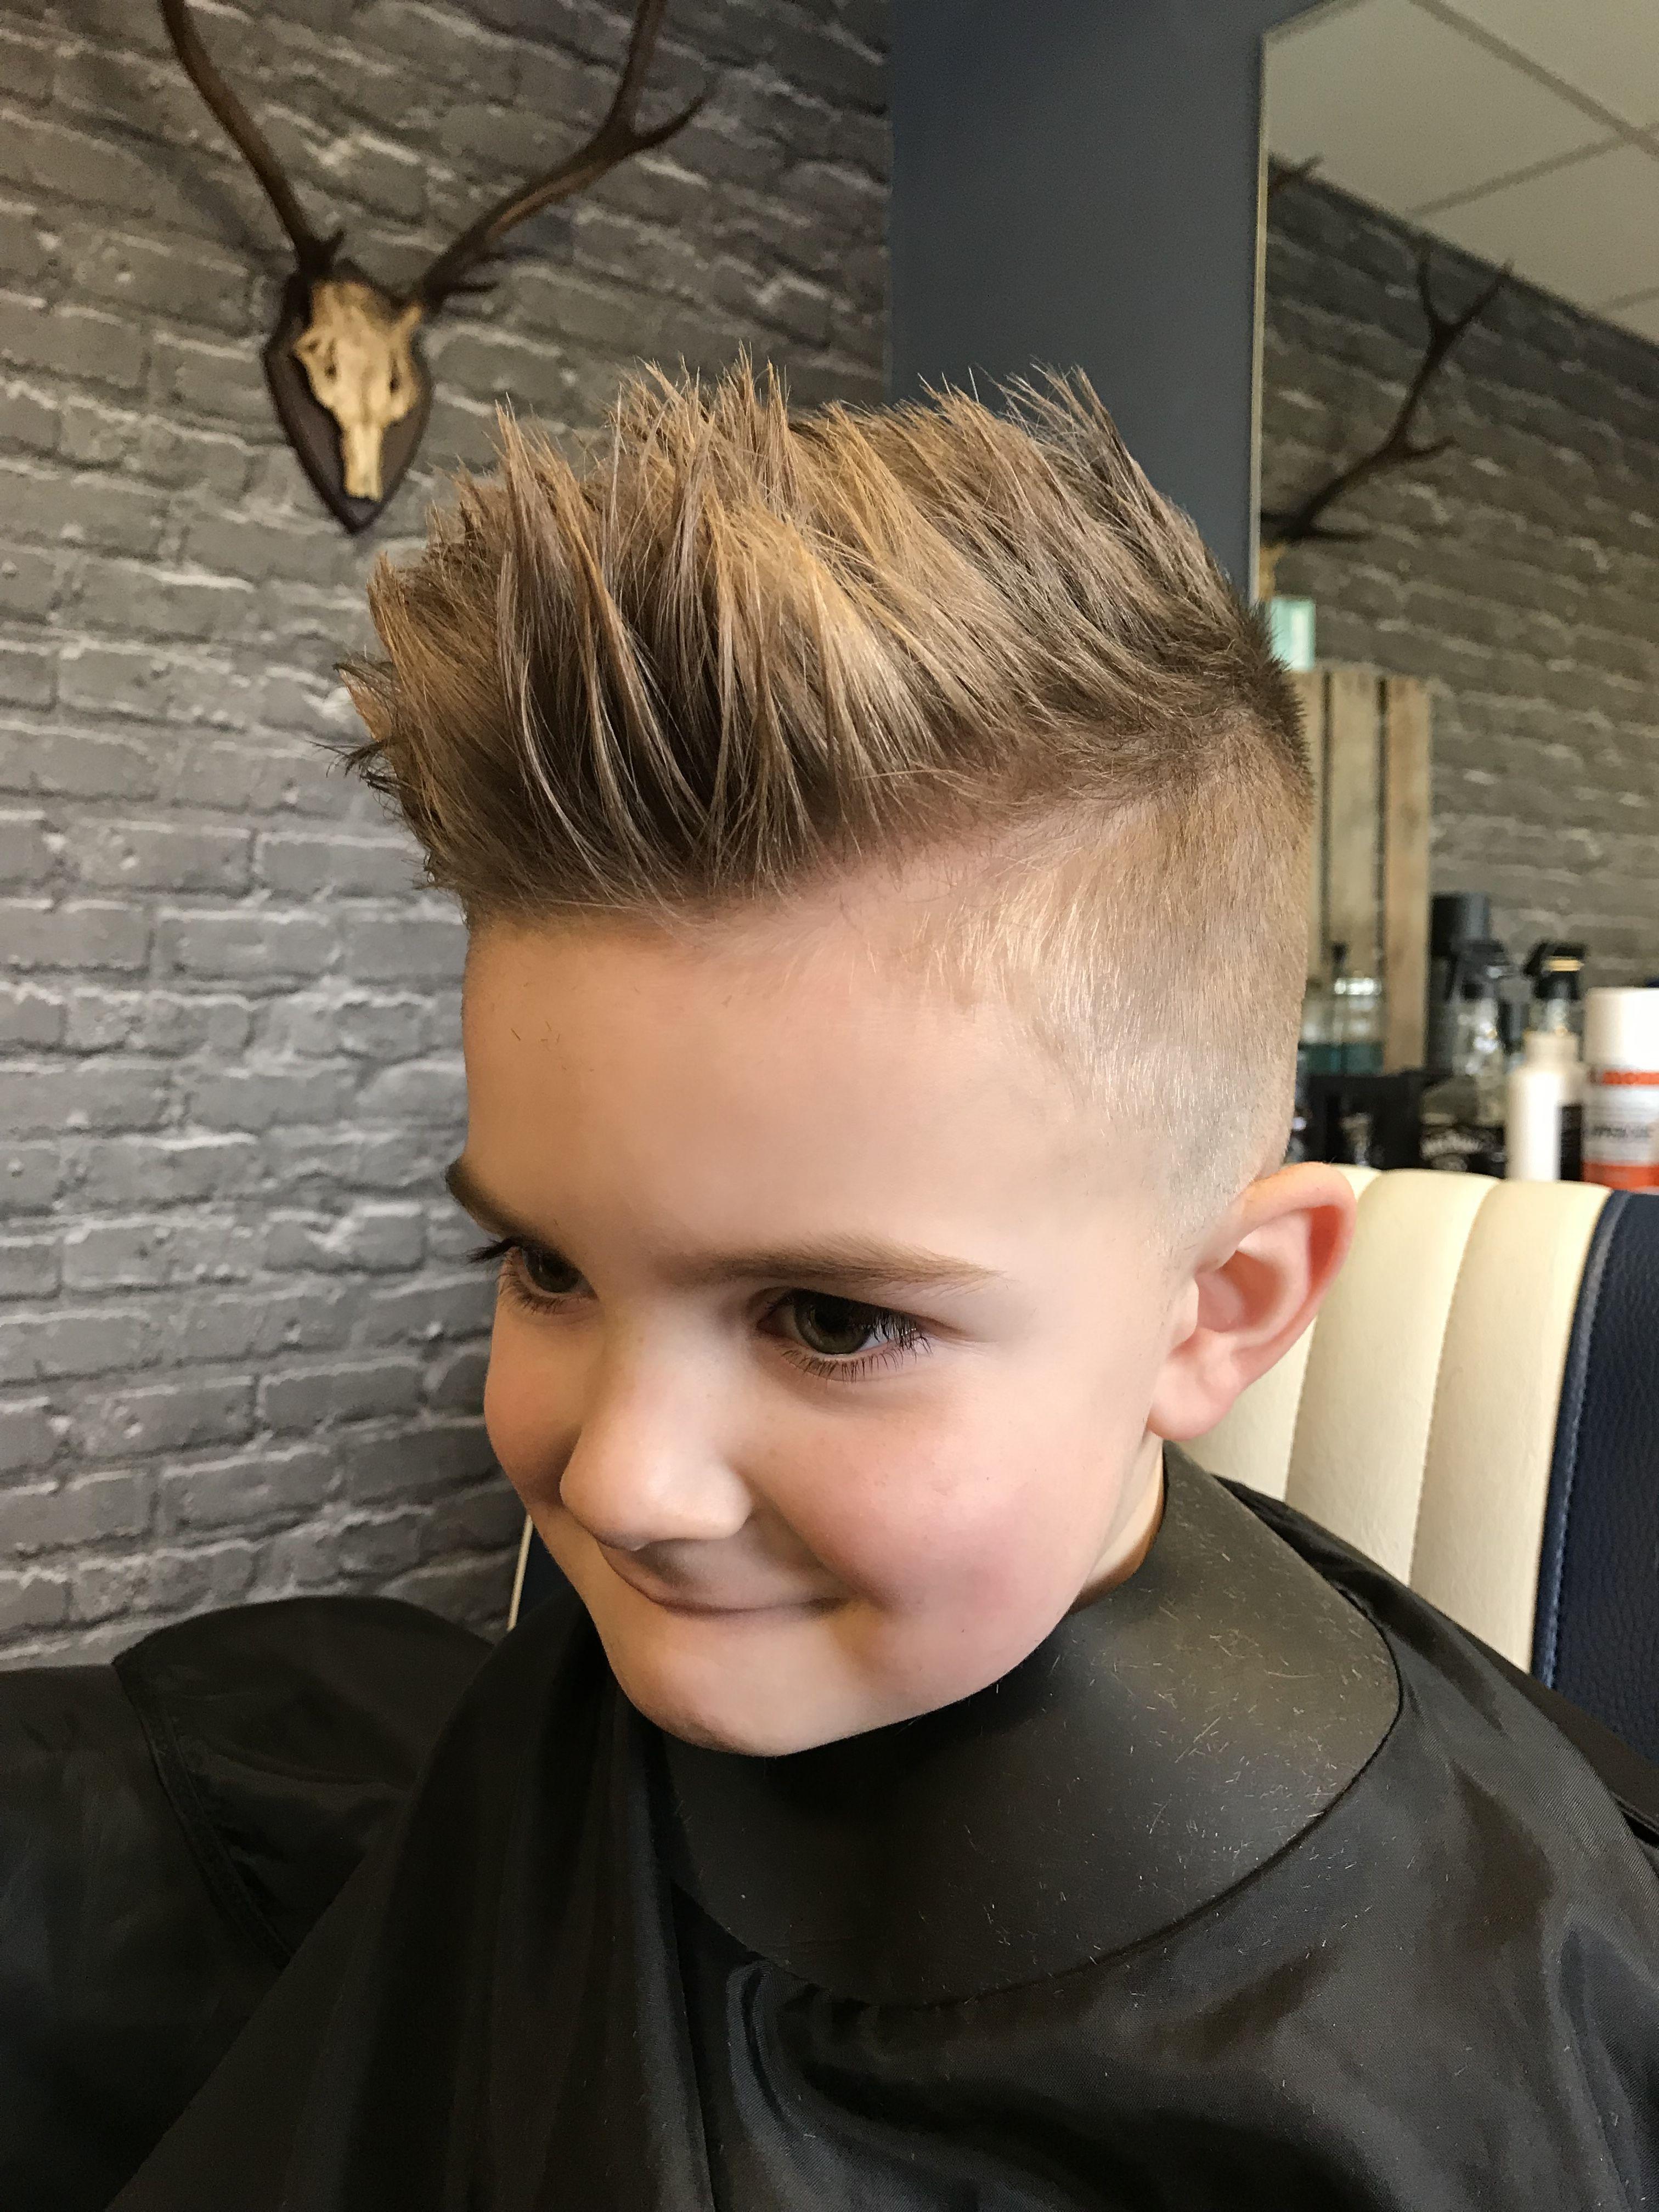 Menshair Hairideas Barbers Barber Barbershop Mensstyles Hairstyles Ladshair Barber Shop Barber Shrewsbury